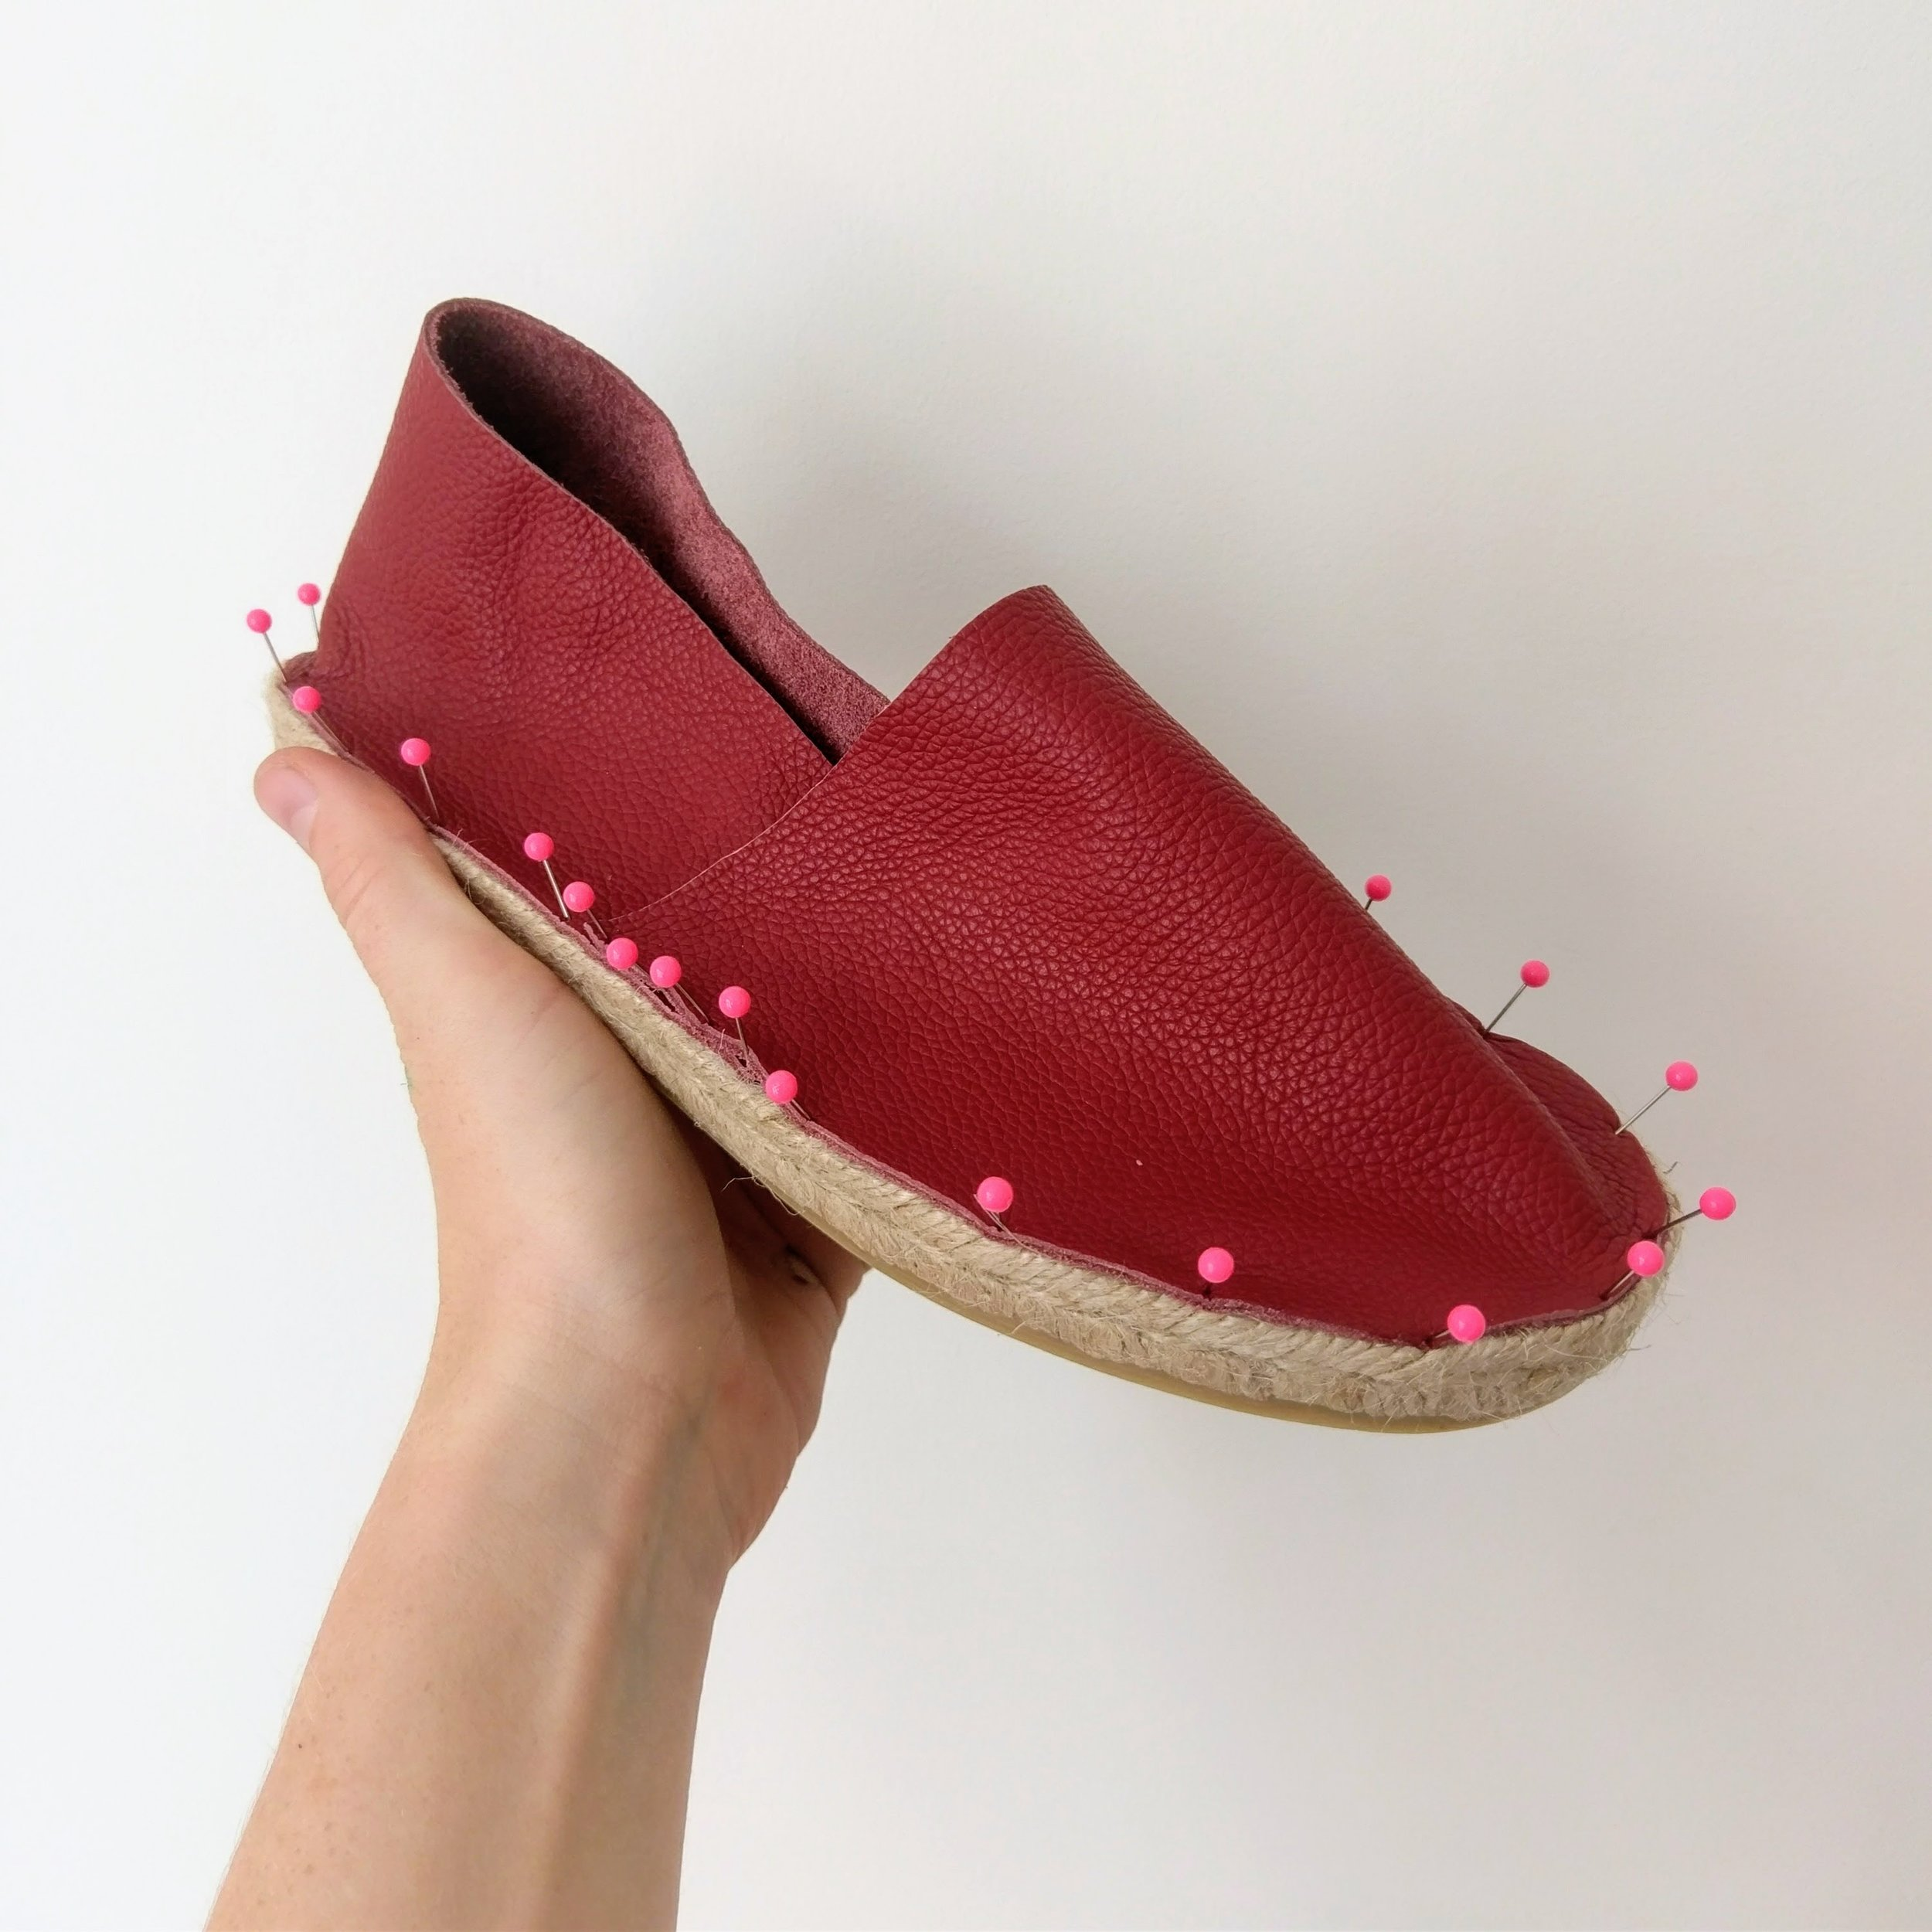 Juta Make Your Own Shoes.jpg